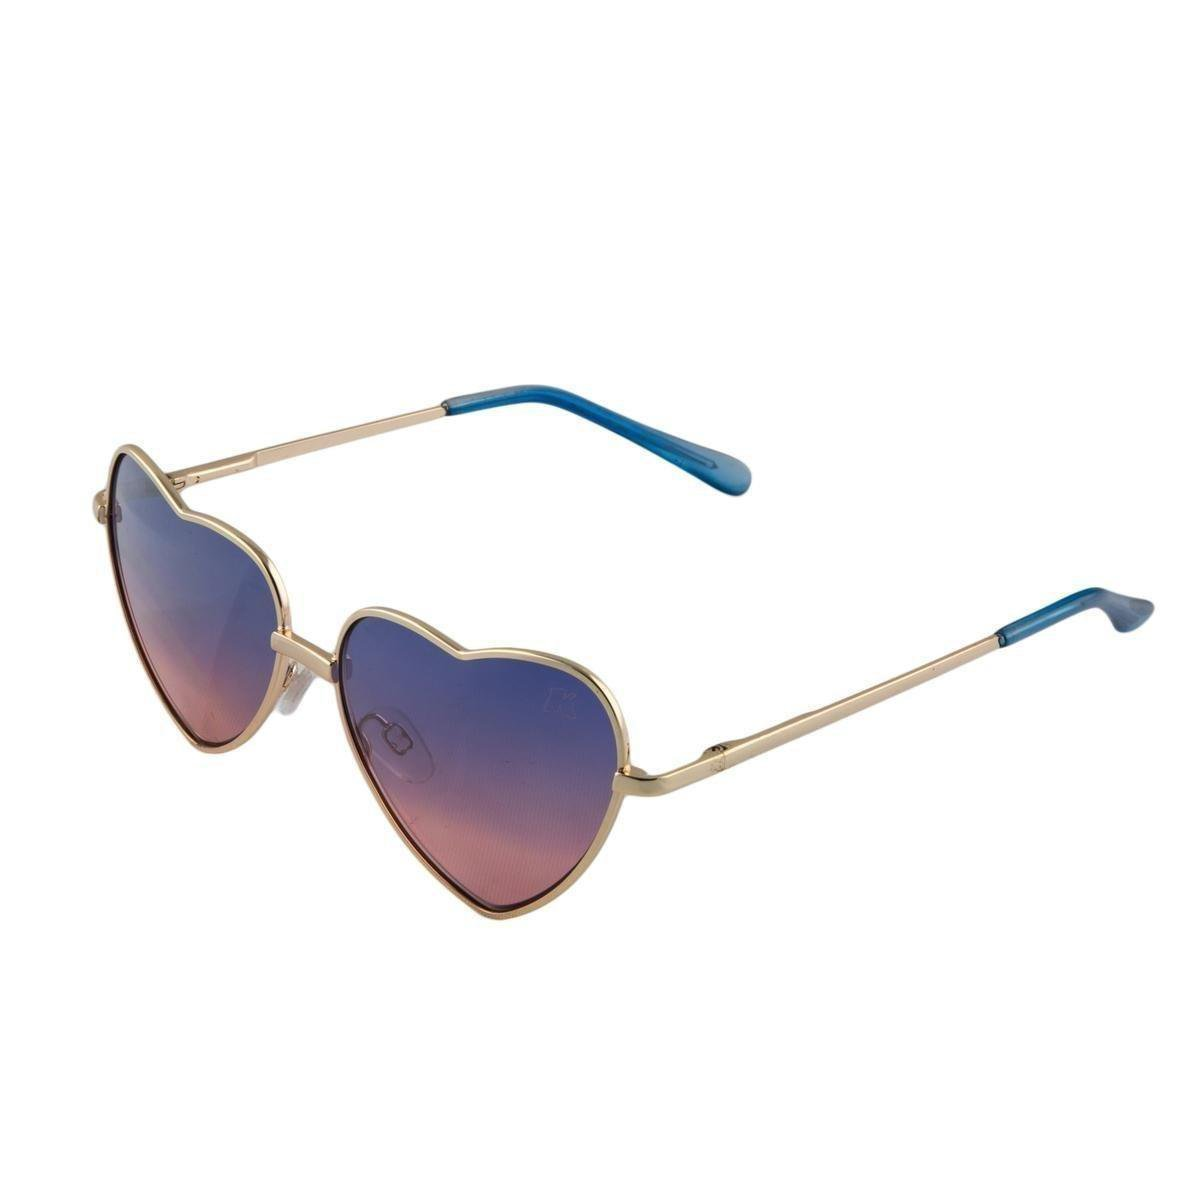 4eddca2675ec5 Óculos Solar Khatto Esportivo KT71165AZ - Compre Agora   Netshoes